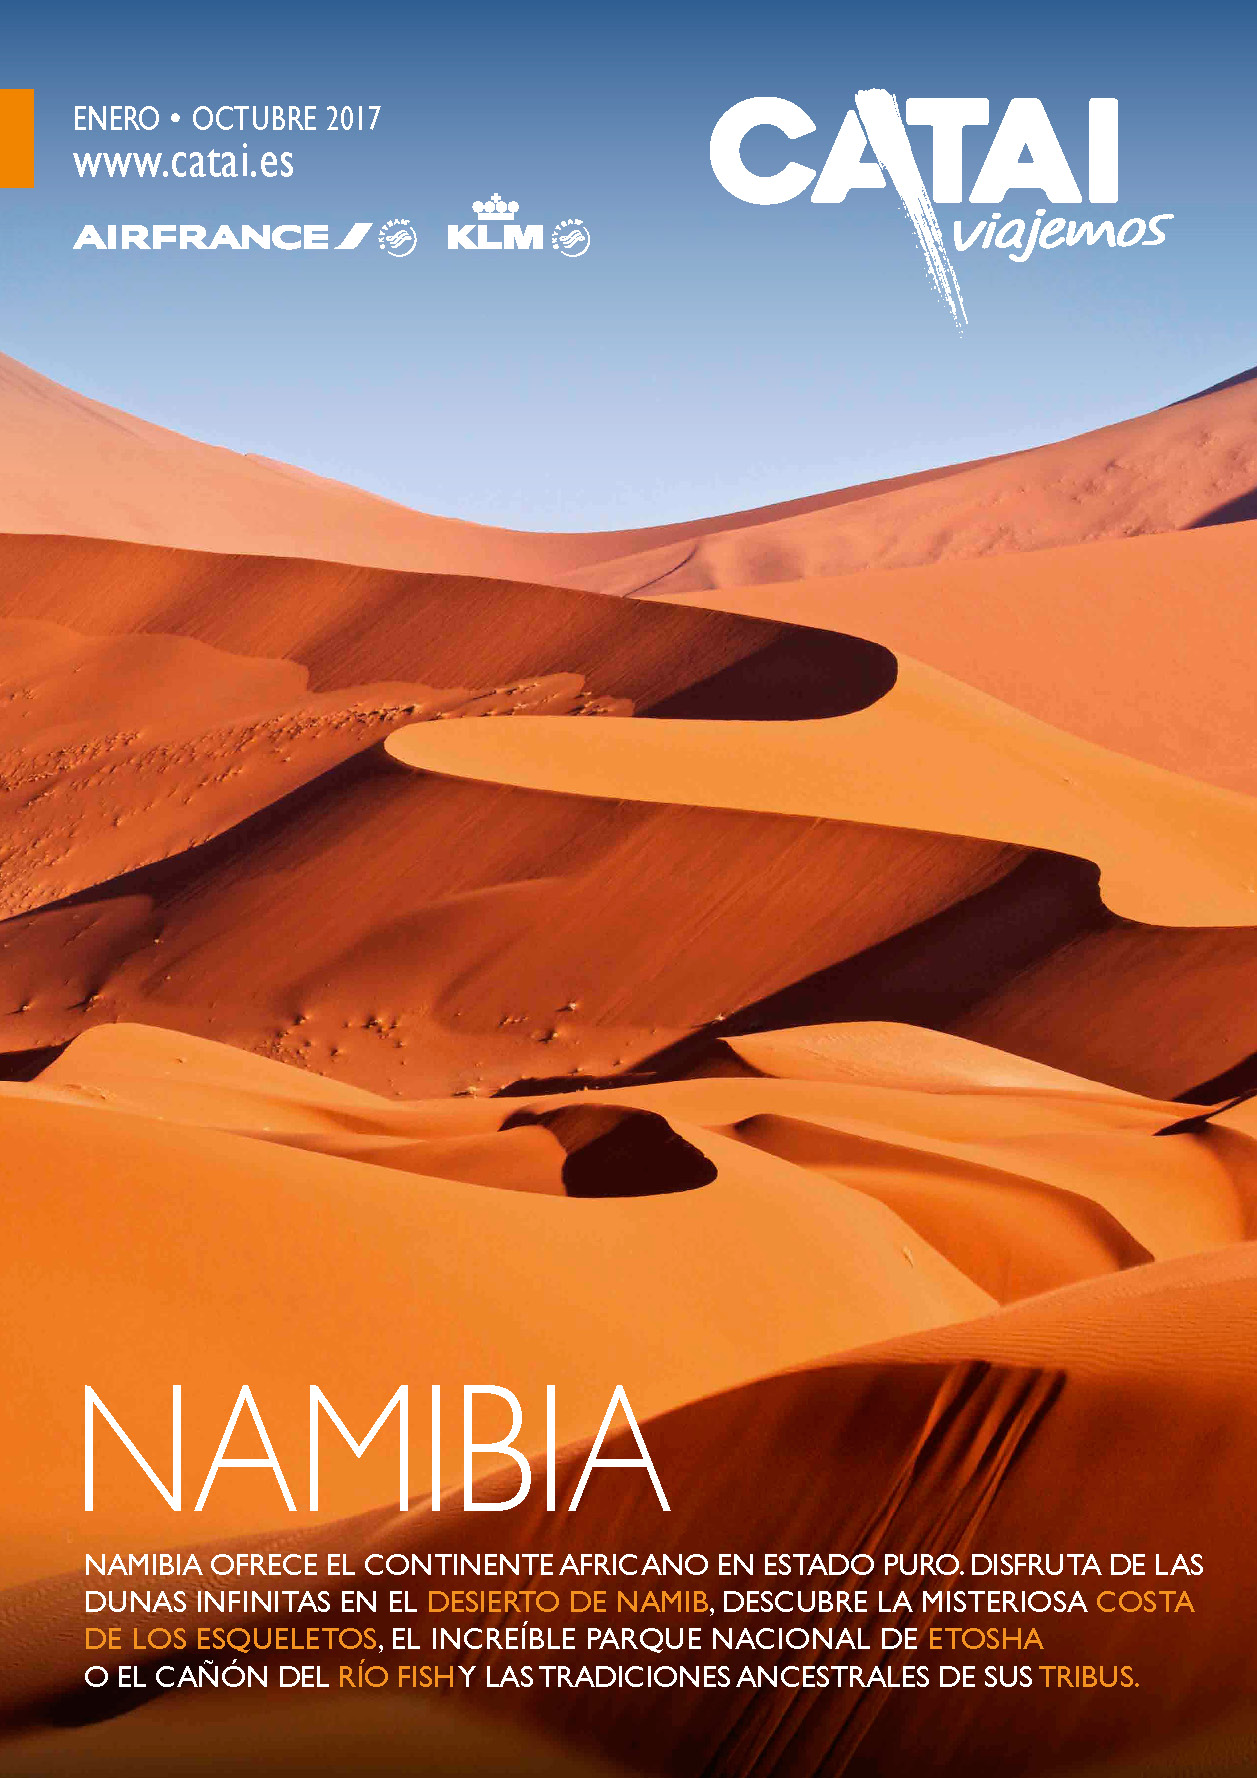 Catai Diptico Namibia 2017